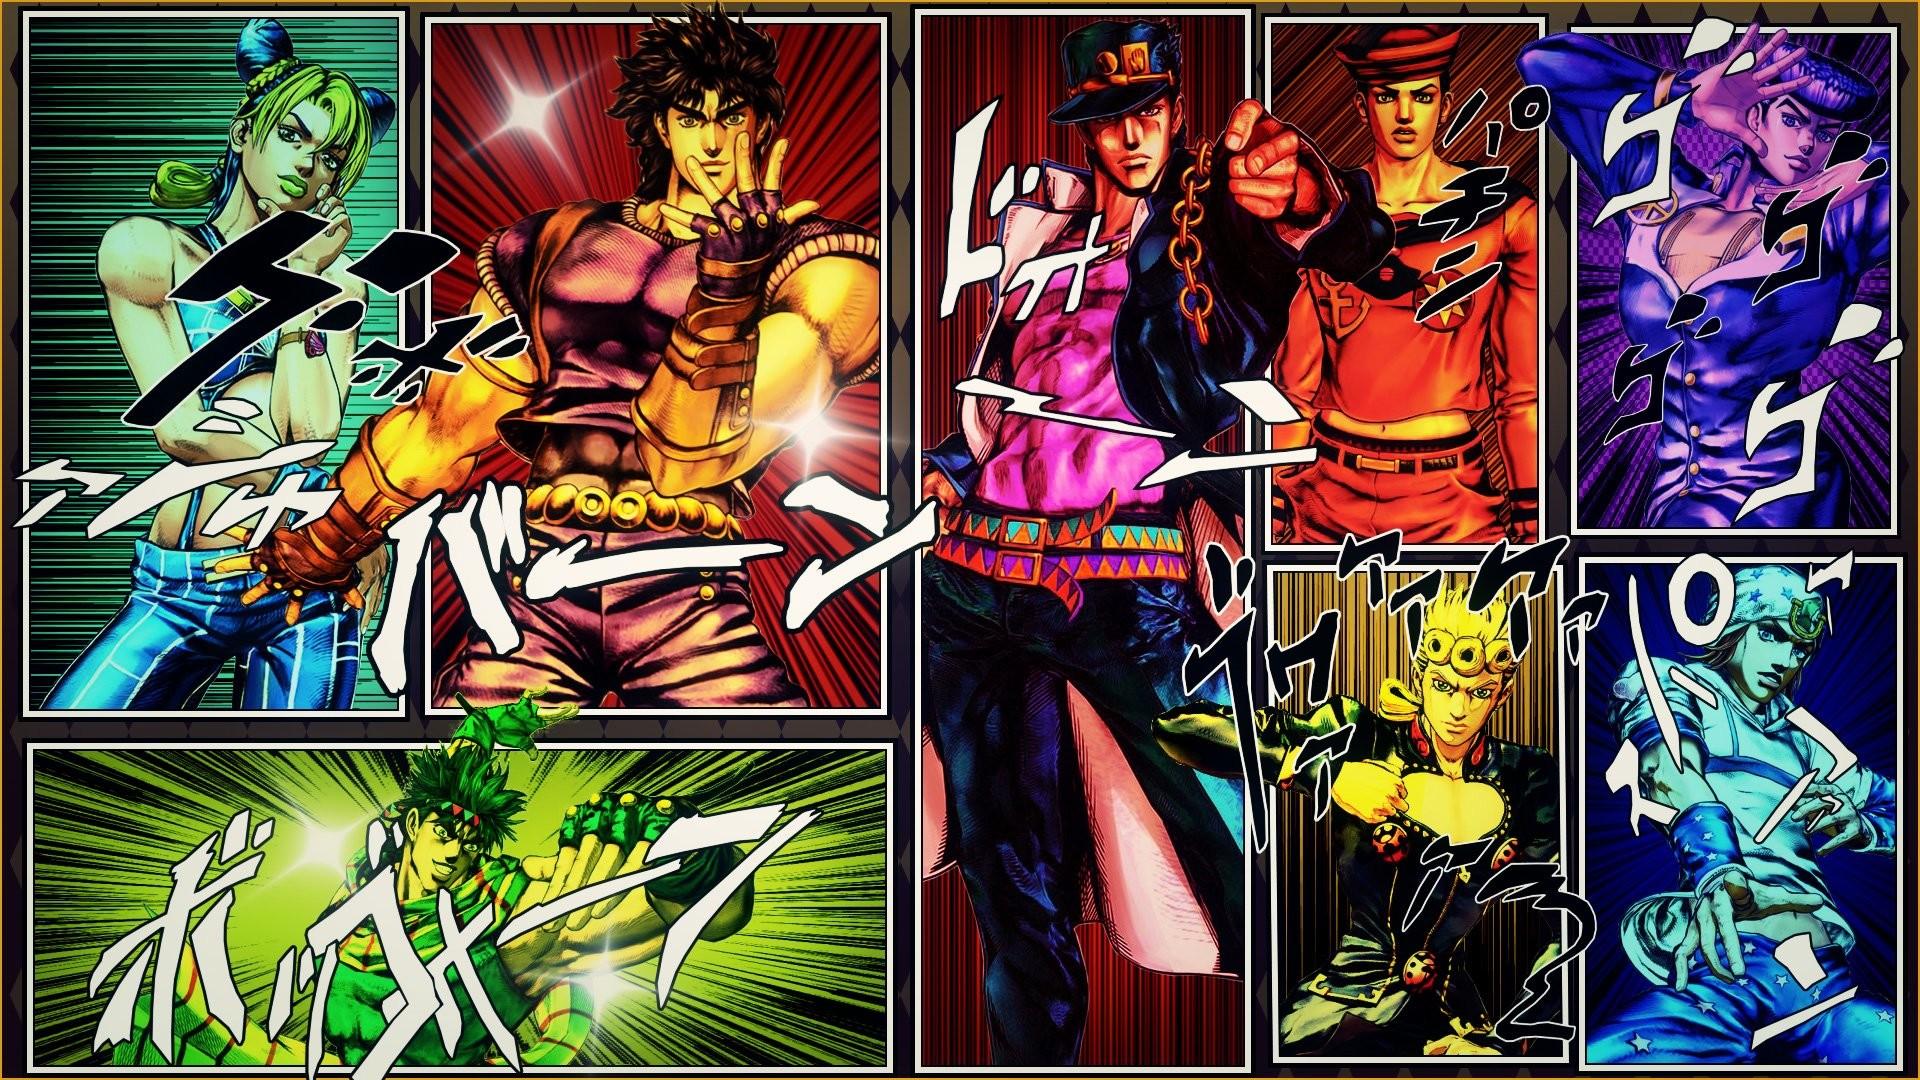 Res: 1920x1080, HD Wallpaper | Background Image ID:755323.  Anime Jojo's Bizarre  Adventure